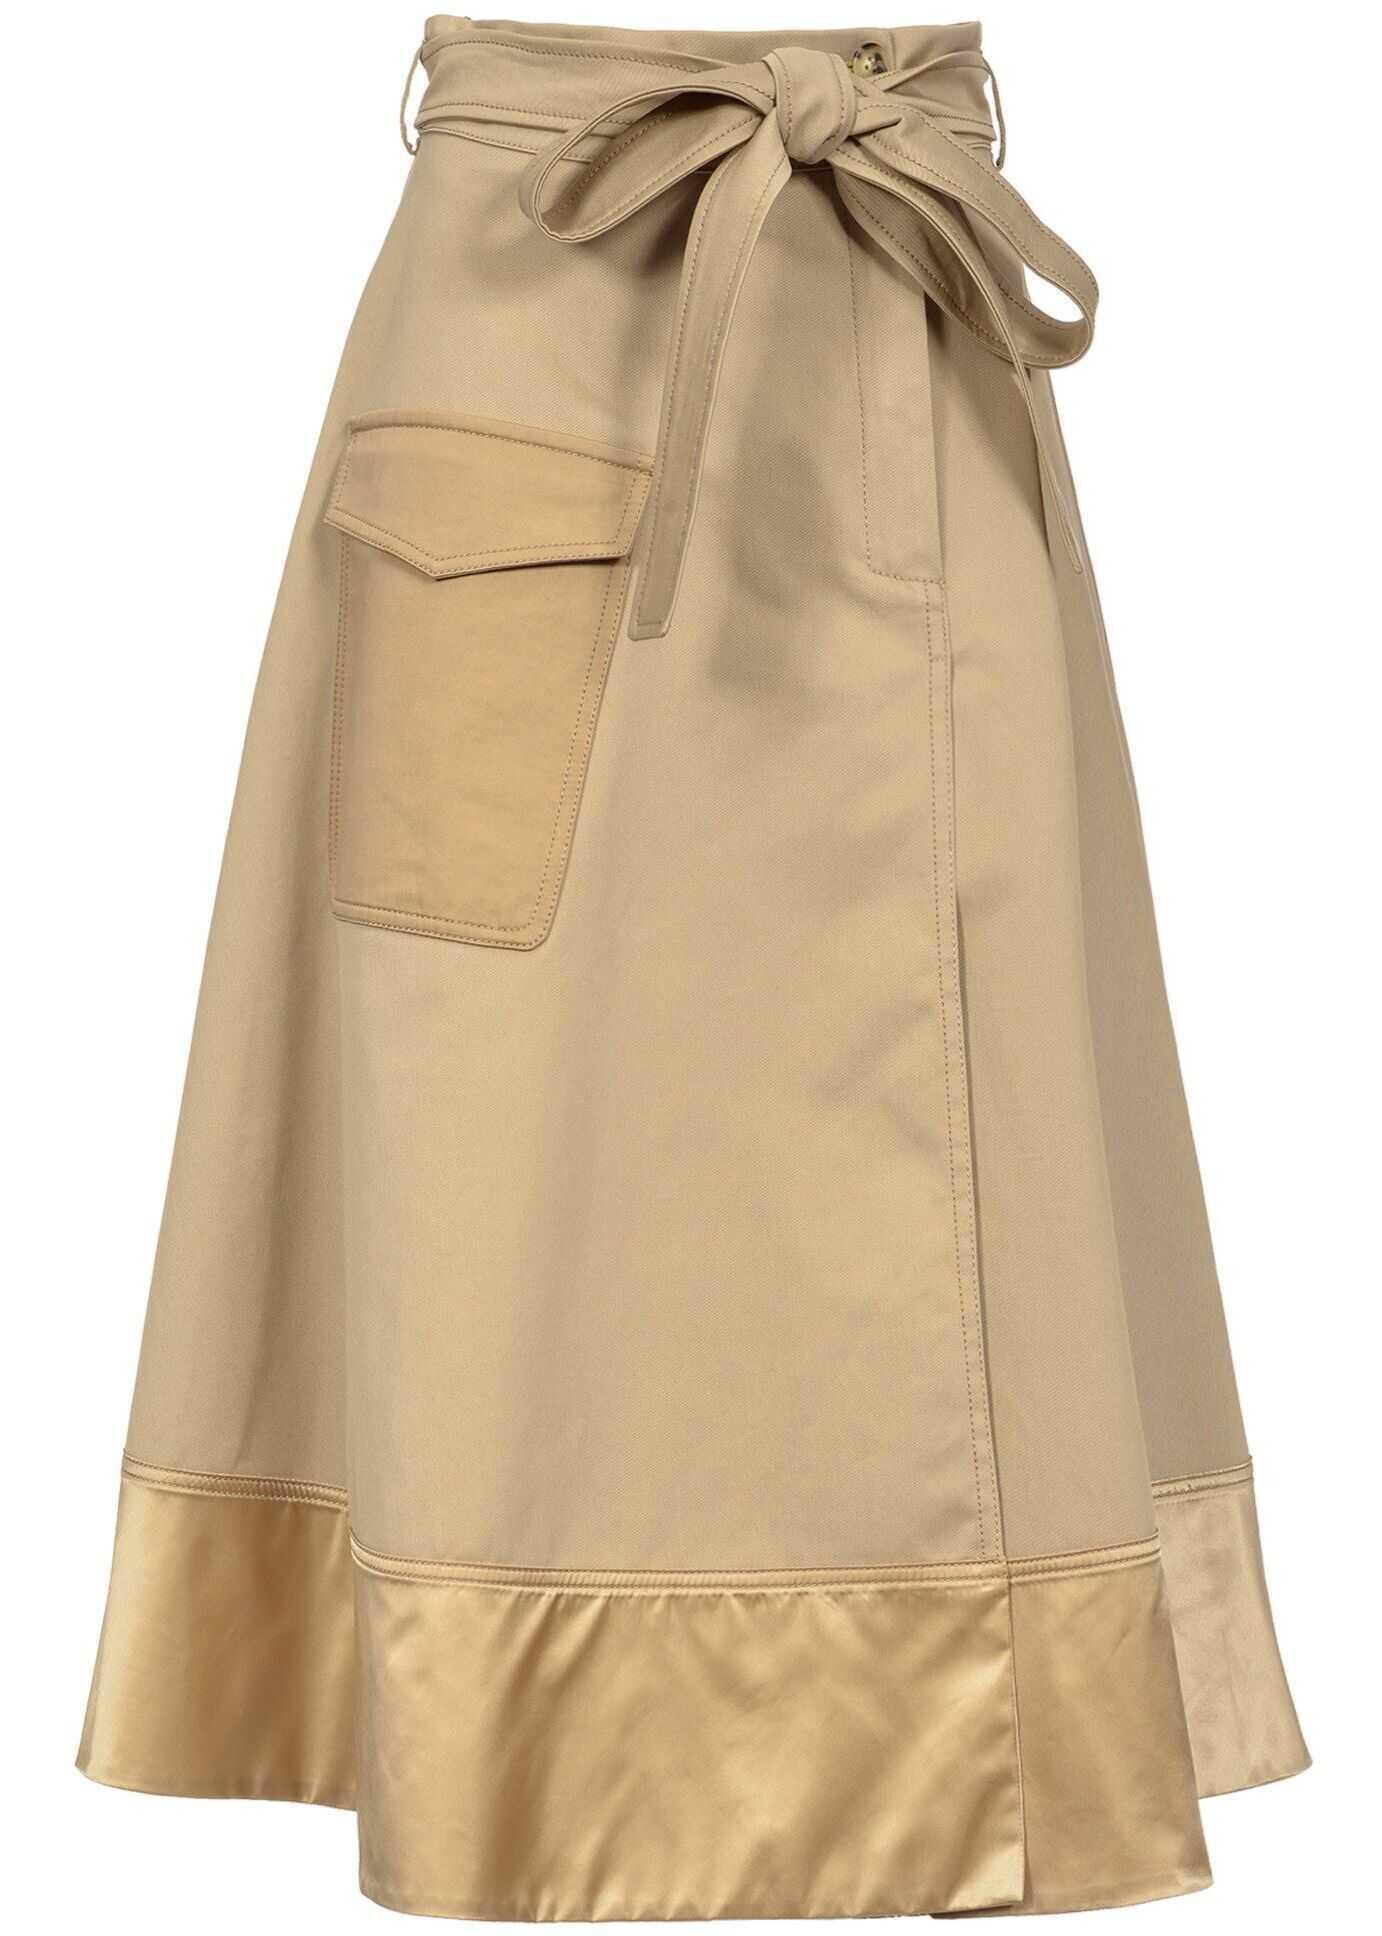 Pinko Cotton Skirt BEIGE